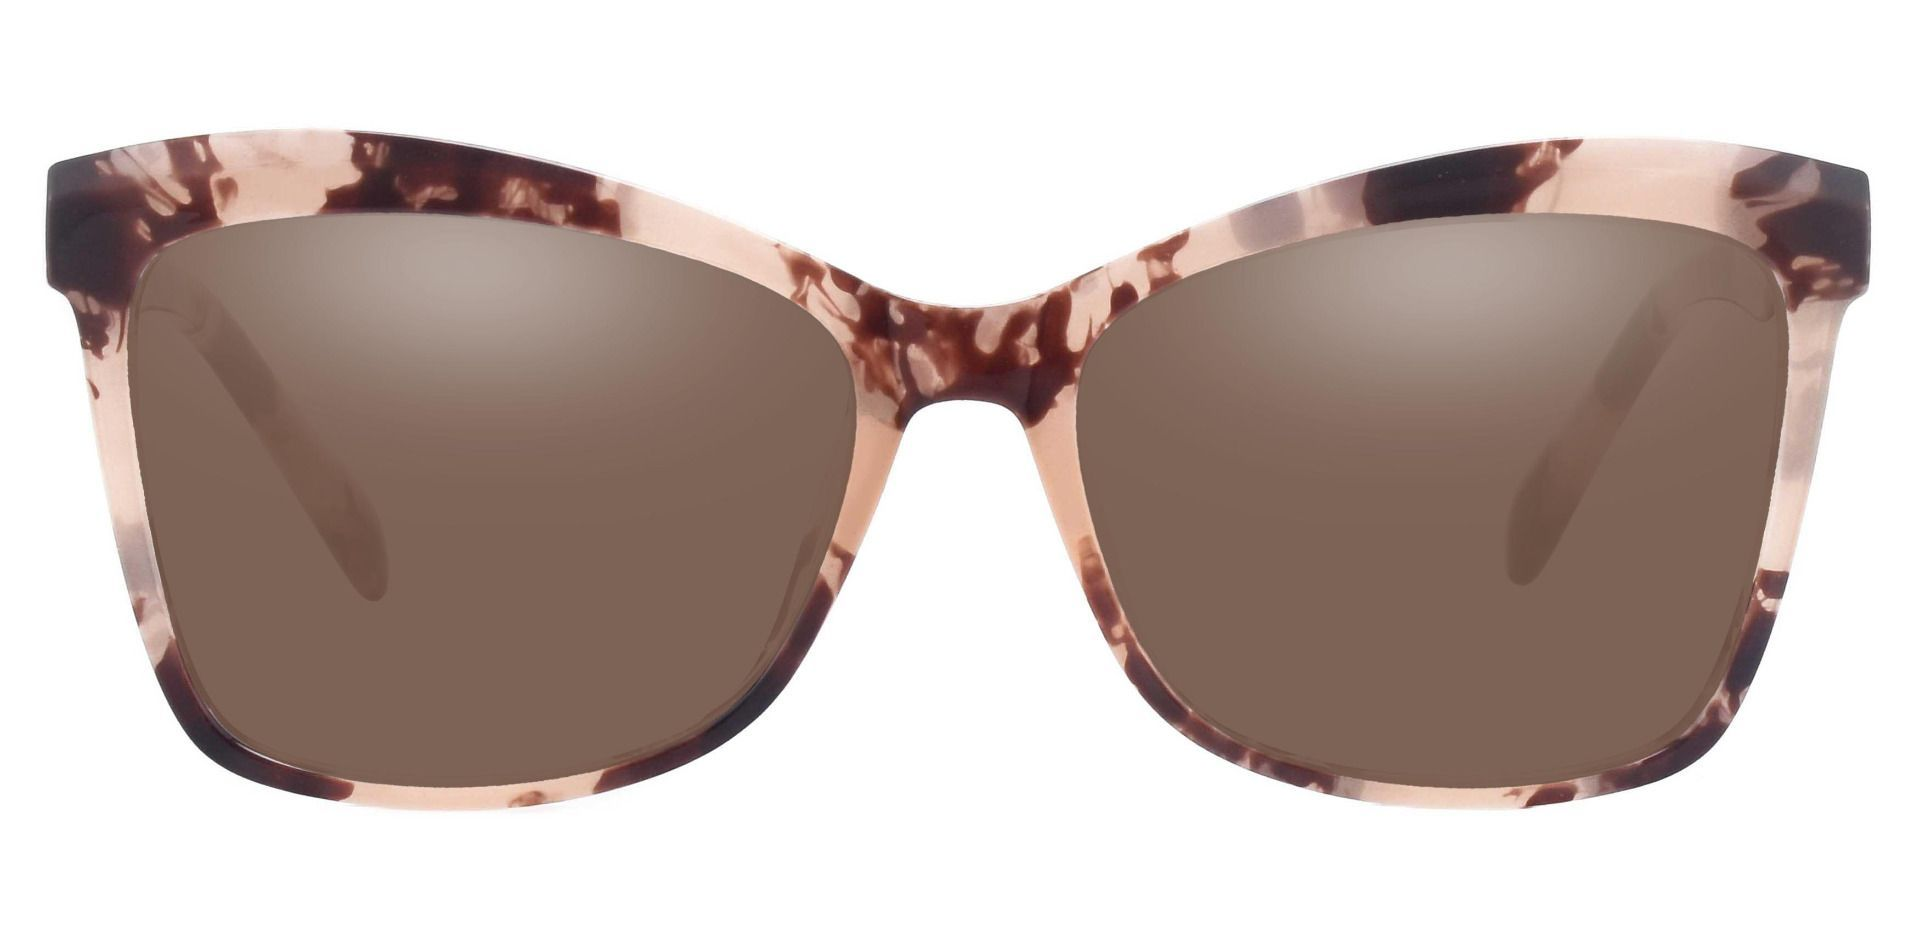 Lexi Cat Eye Non-Rx Sunglasses - Tortoise Frame With Brown Lenses